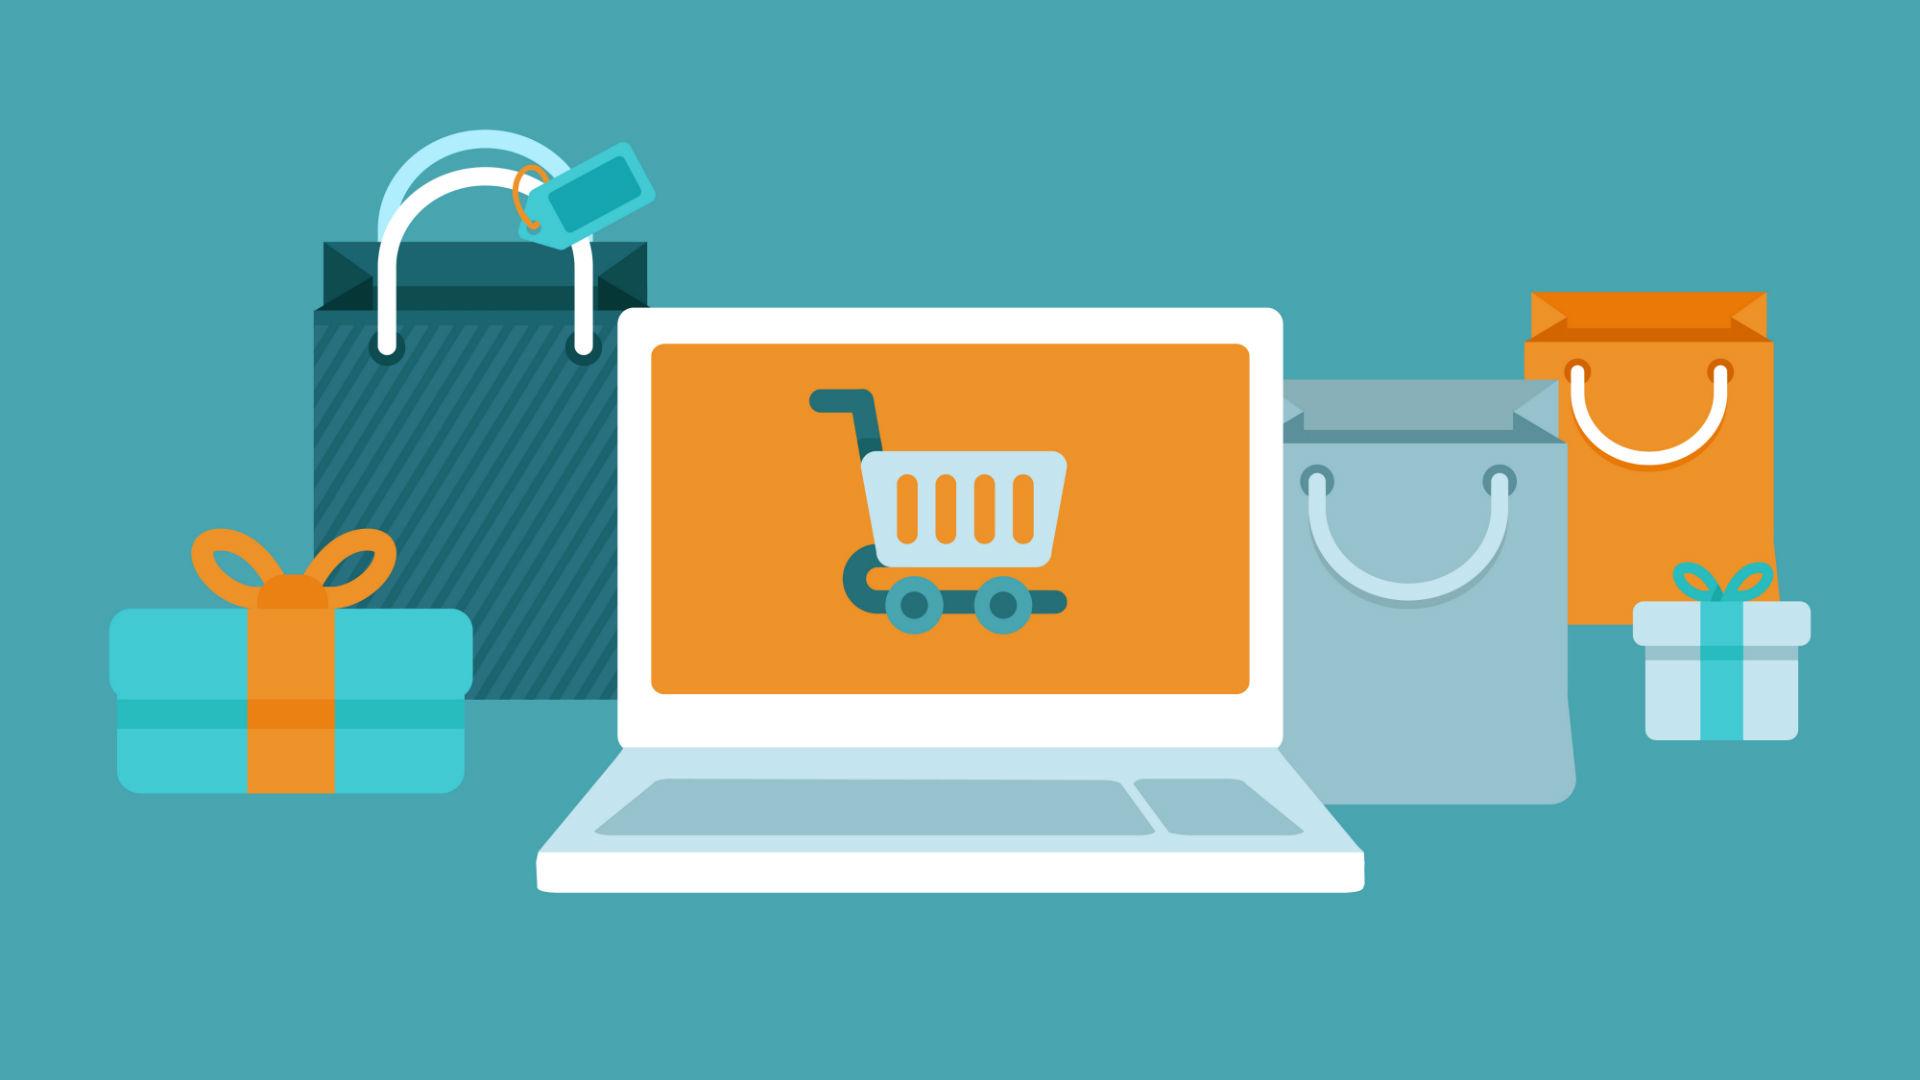 ecommerce featured image